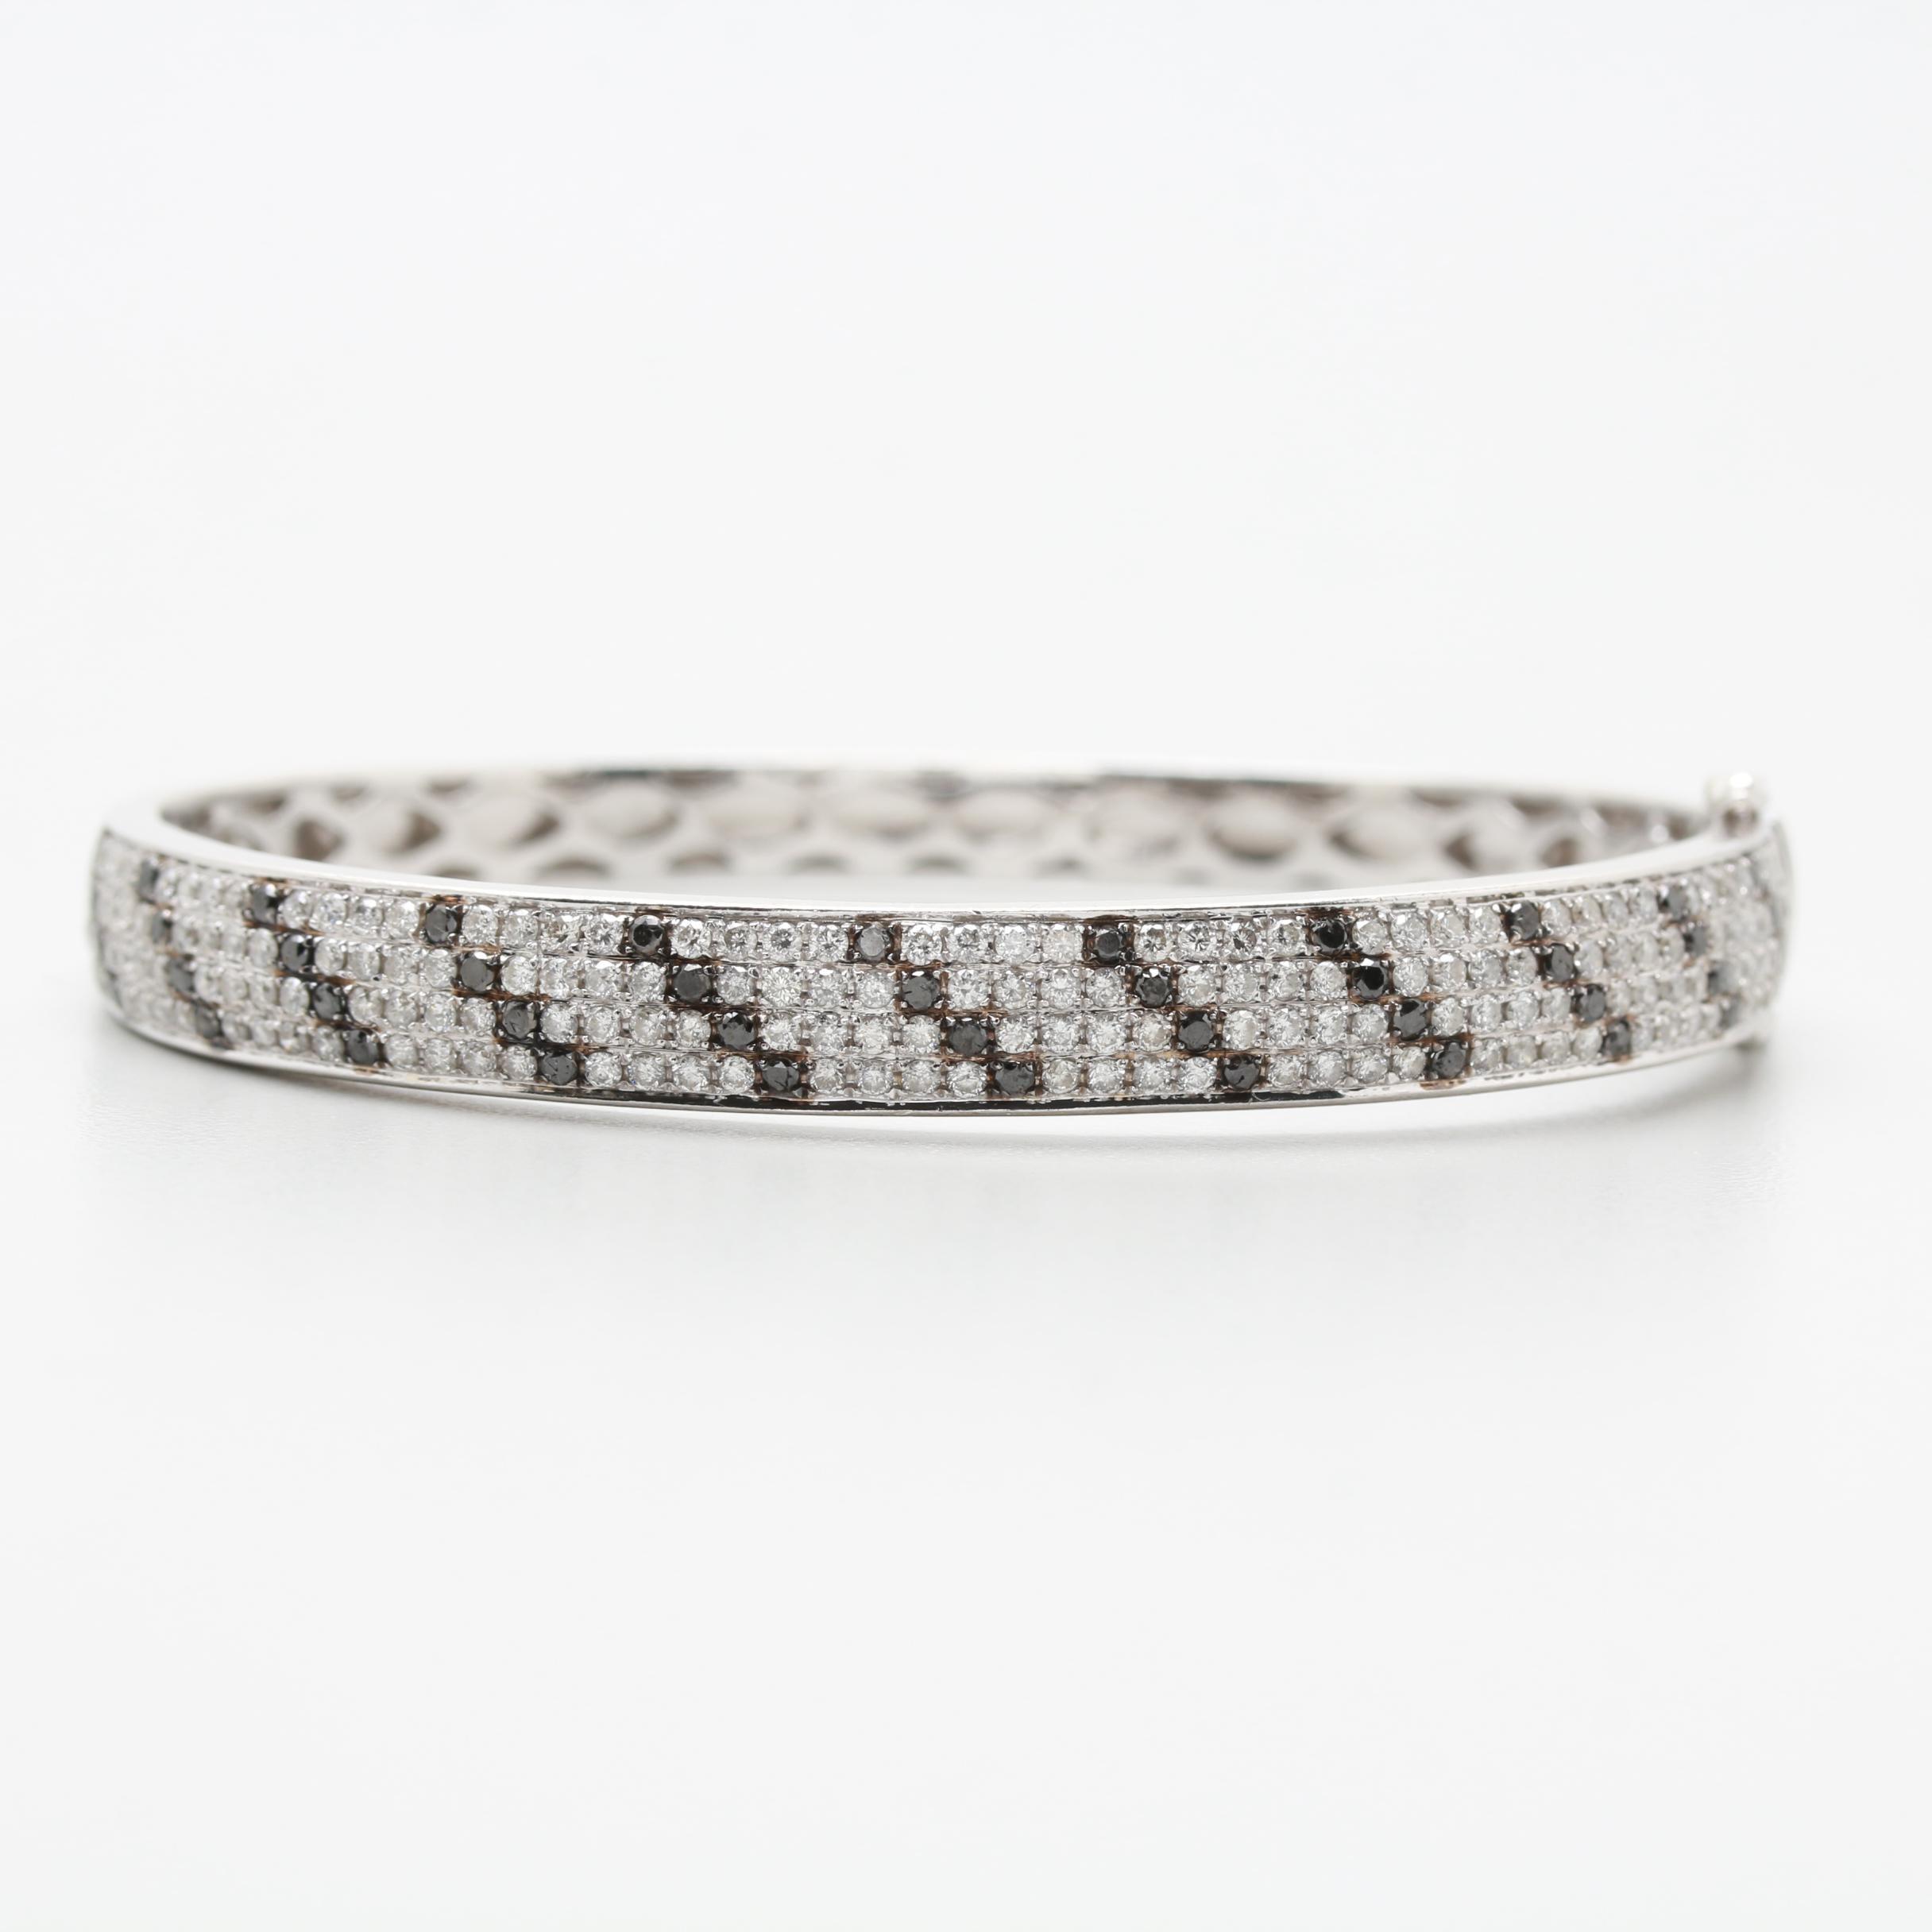 Joe Rodeo 14K White Gold 2.27 CTW Diamond Bracelet